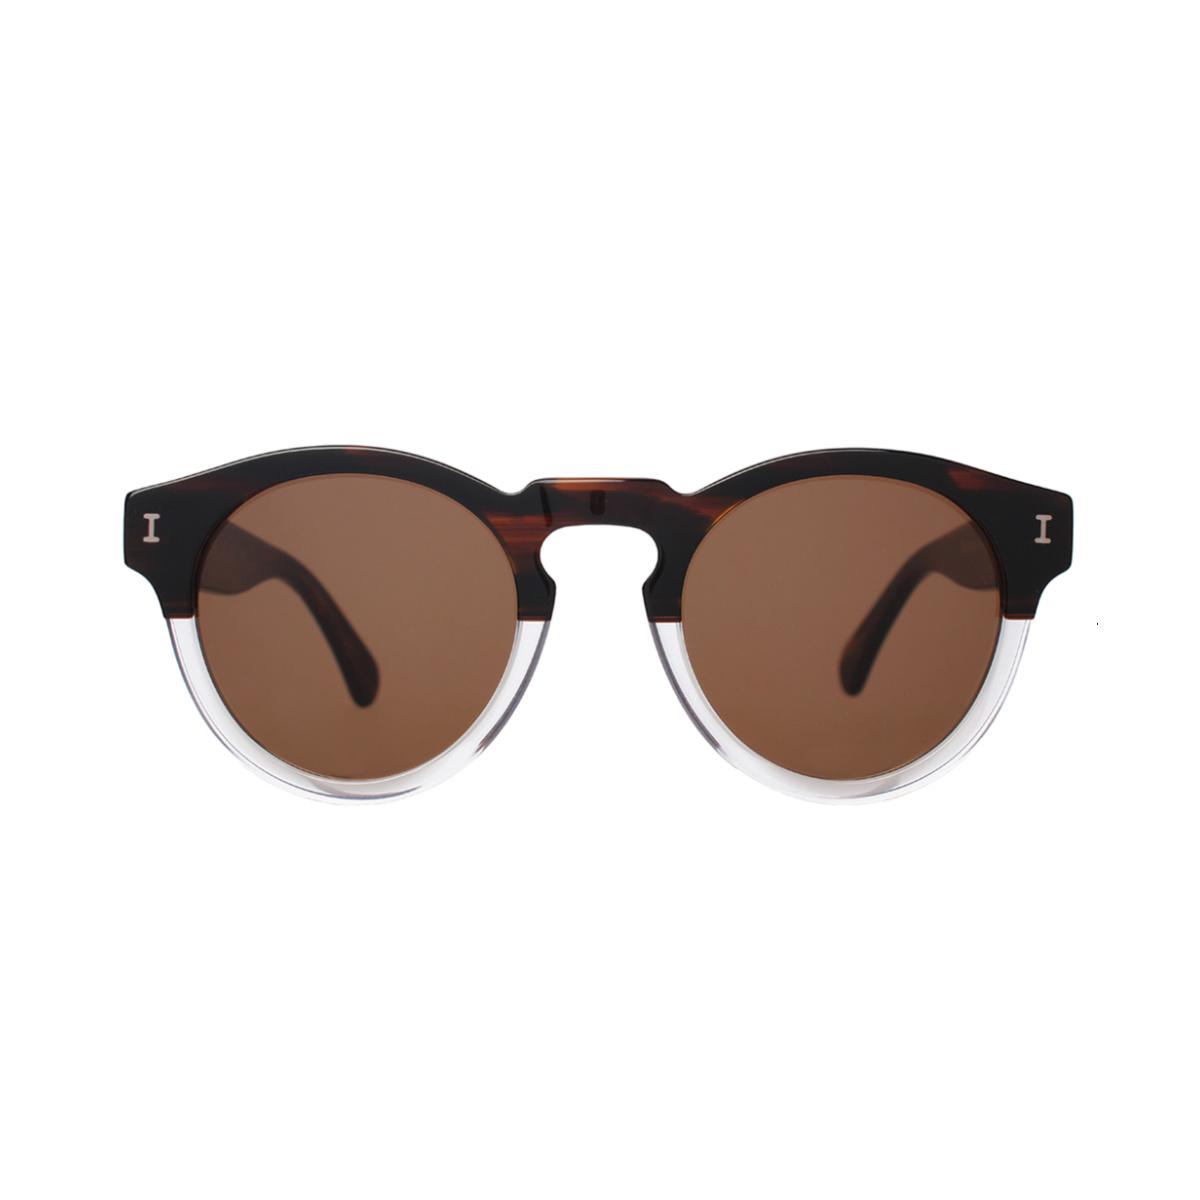 02e27297e Illesteva 'Leonard' Sunglasses - Meghan's Mirror